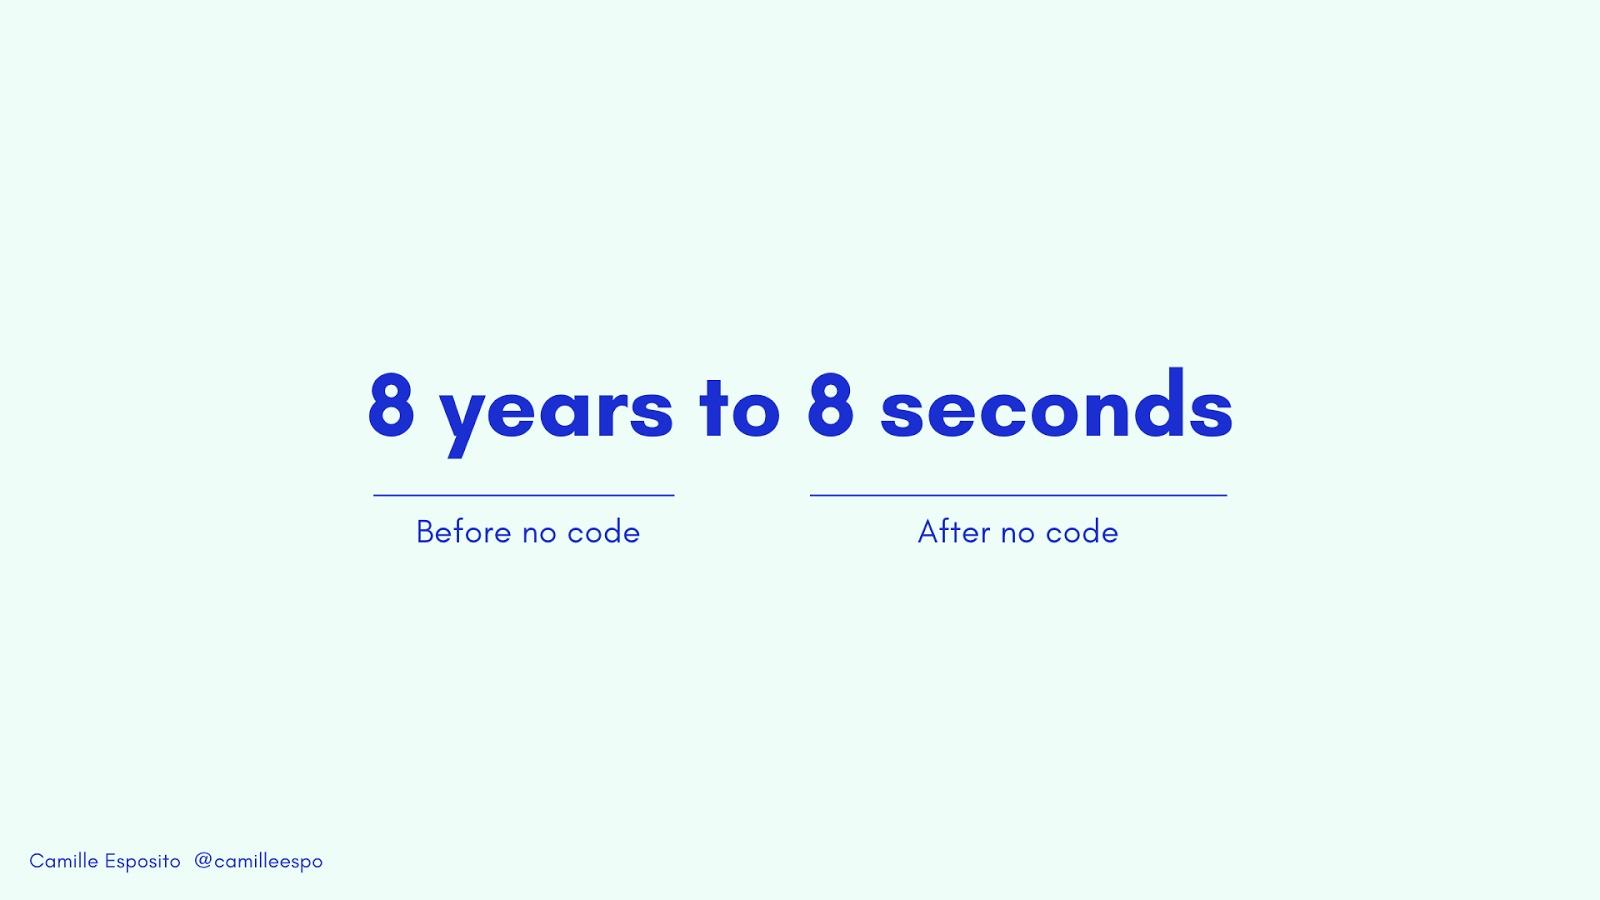 webflow speeds up front-end development